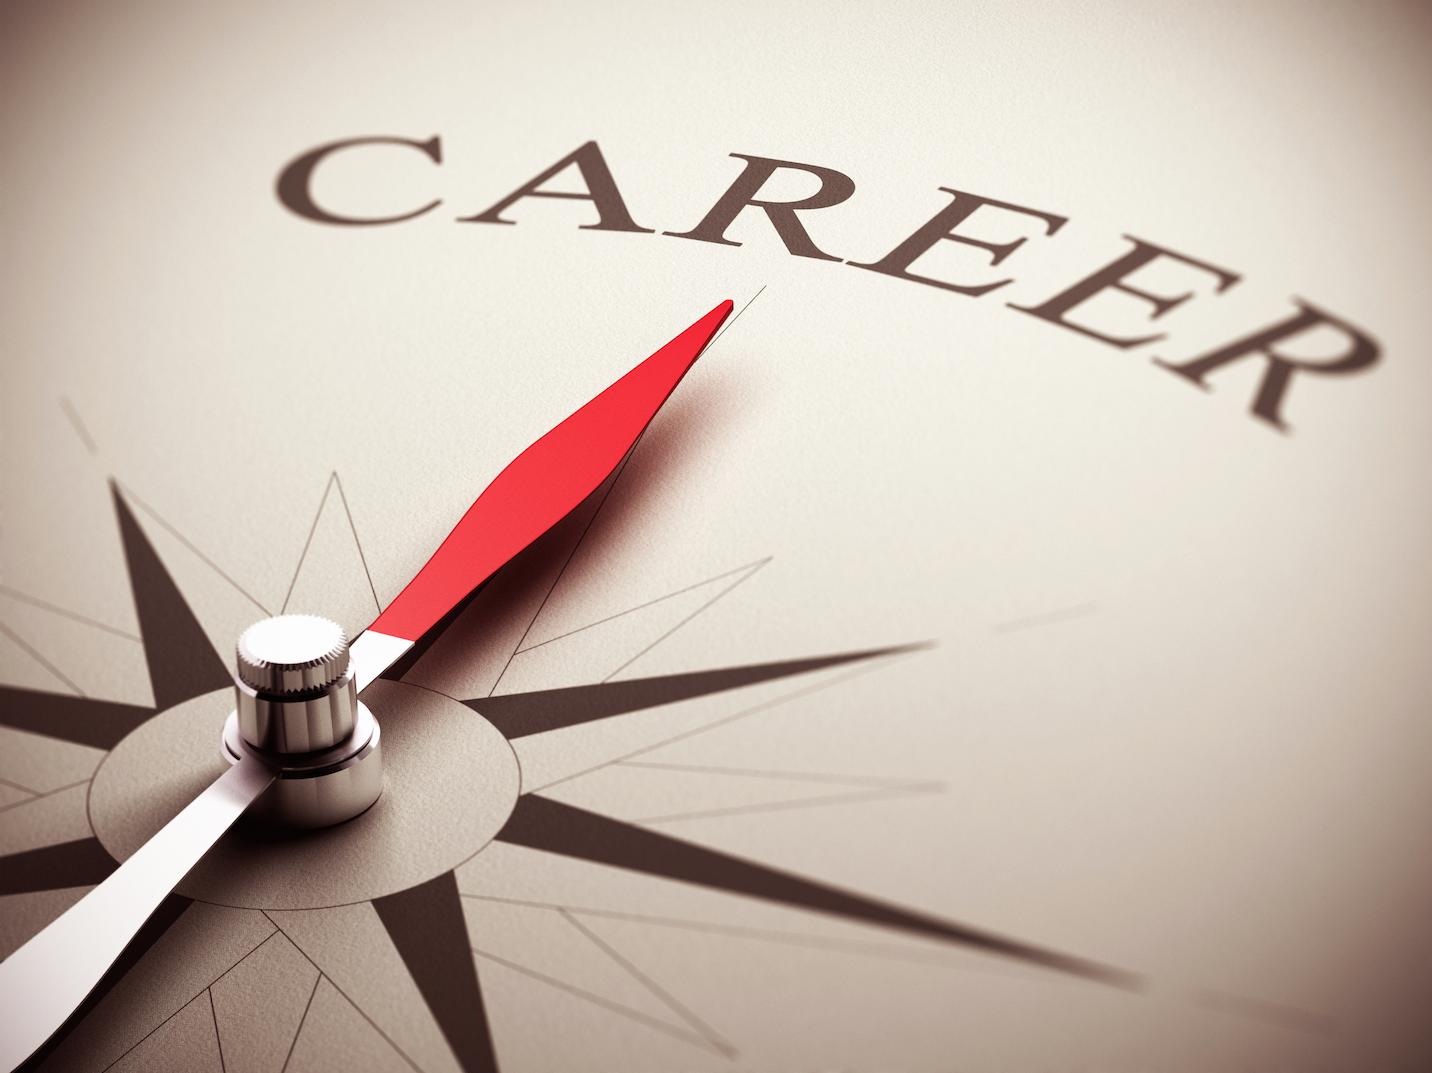 Career Compass.jpeg